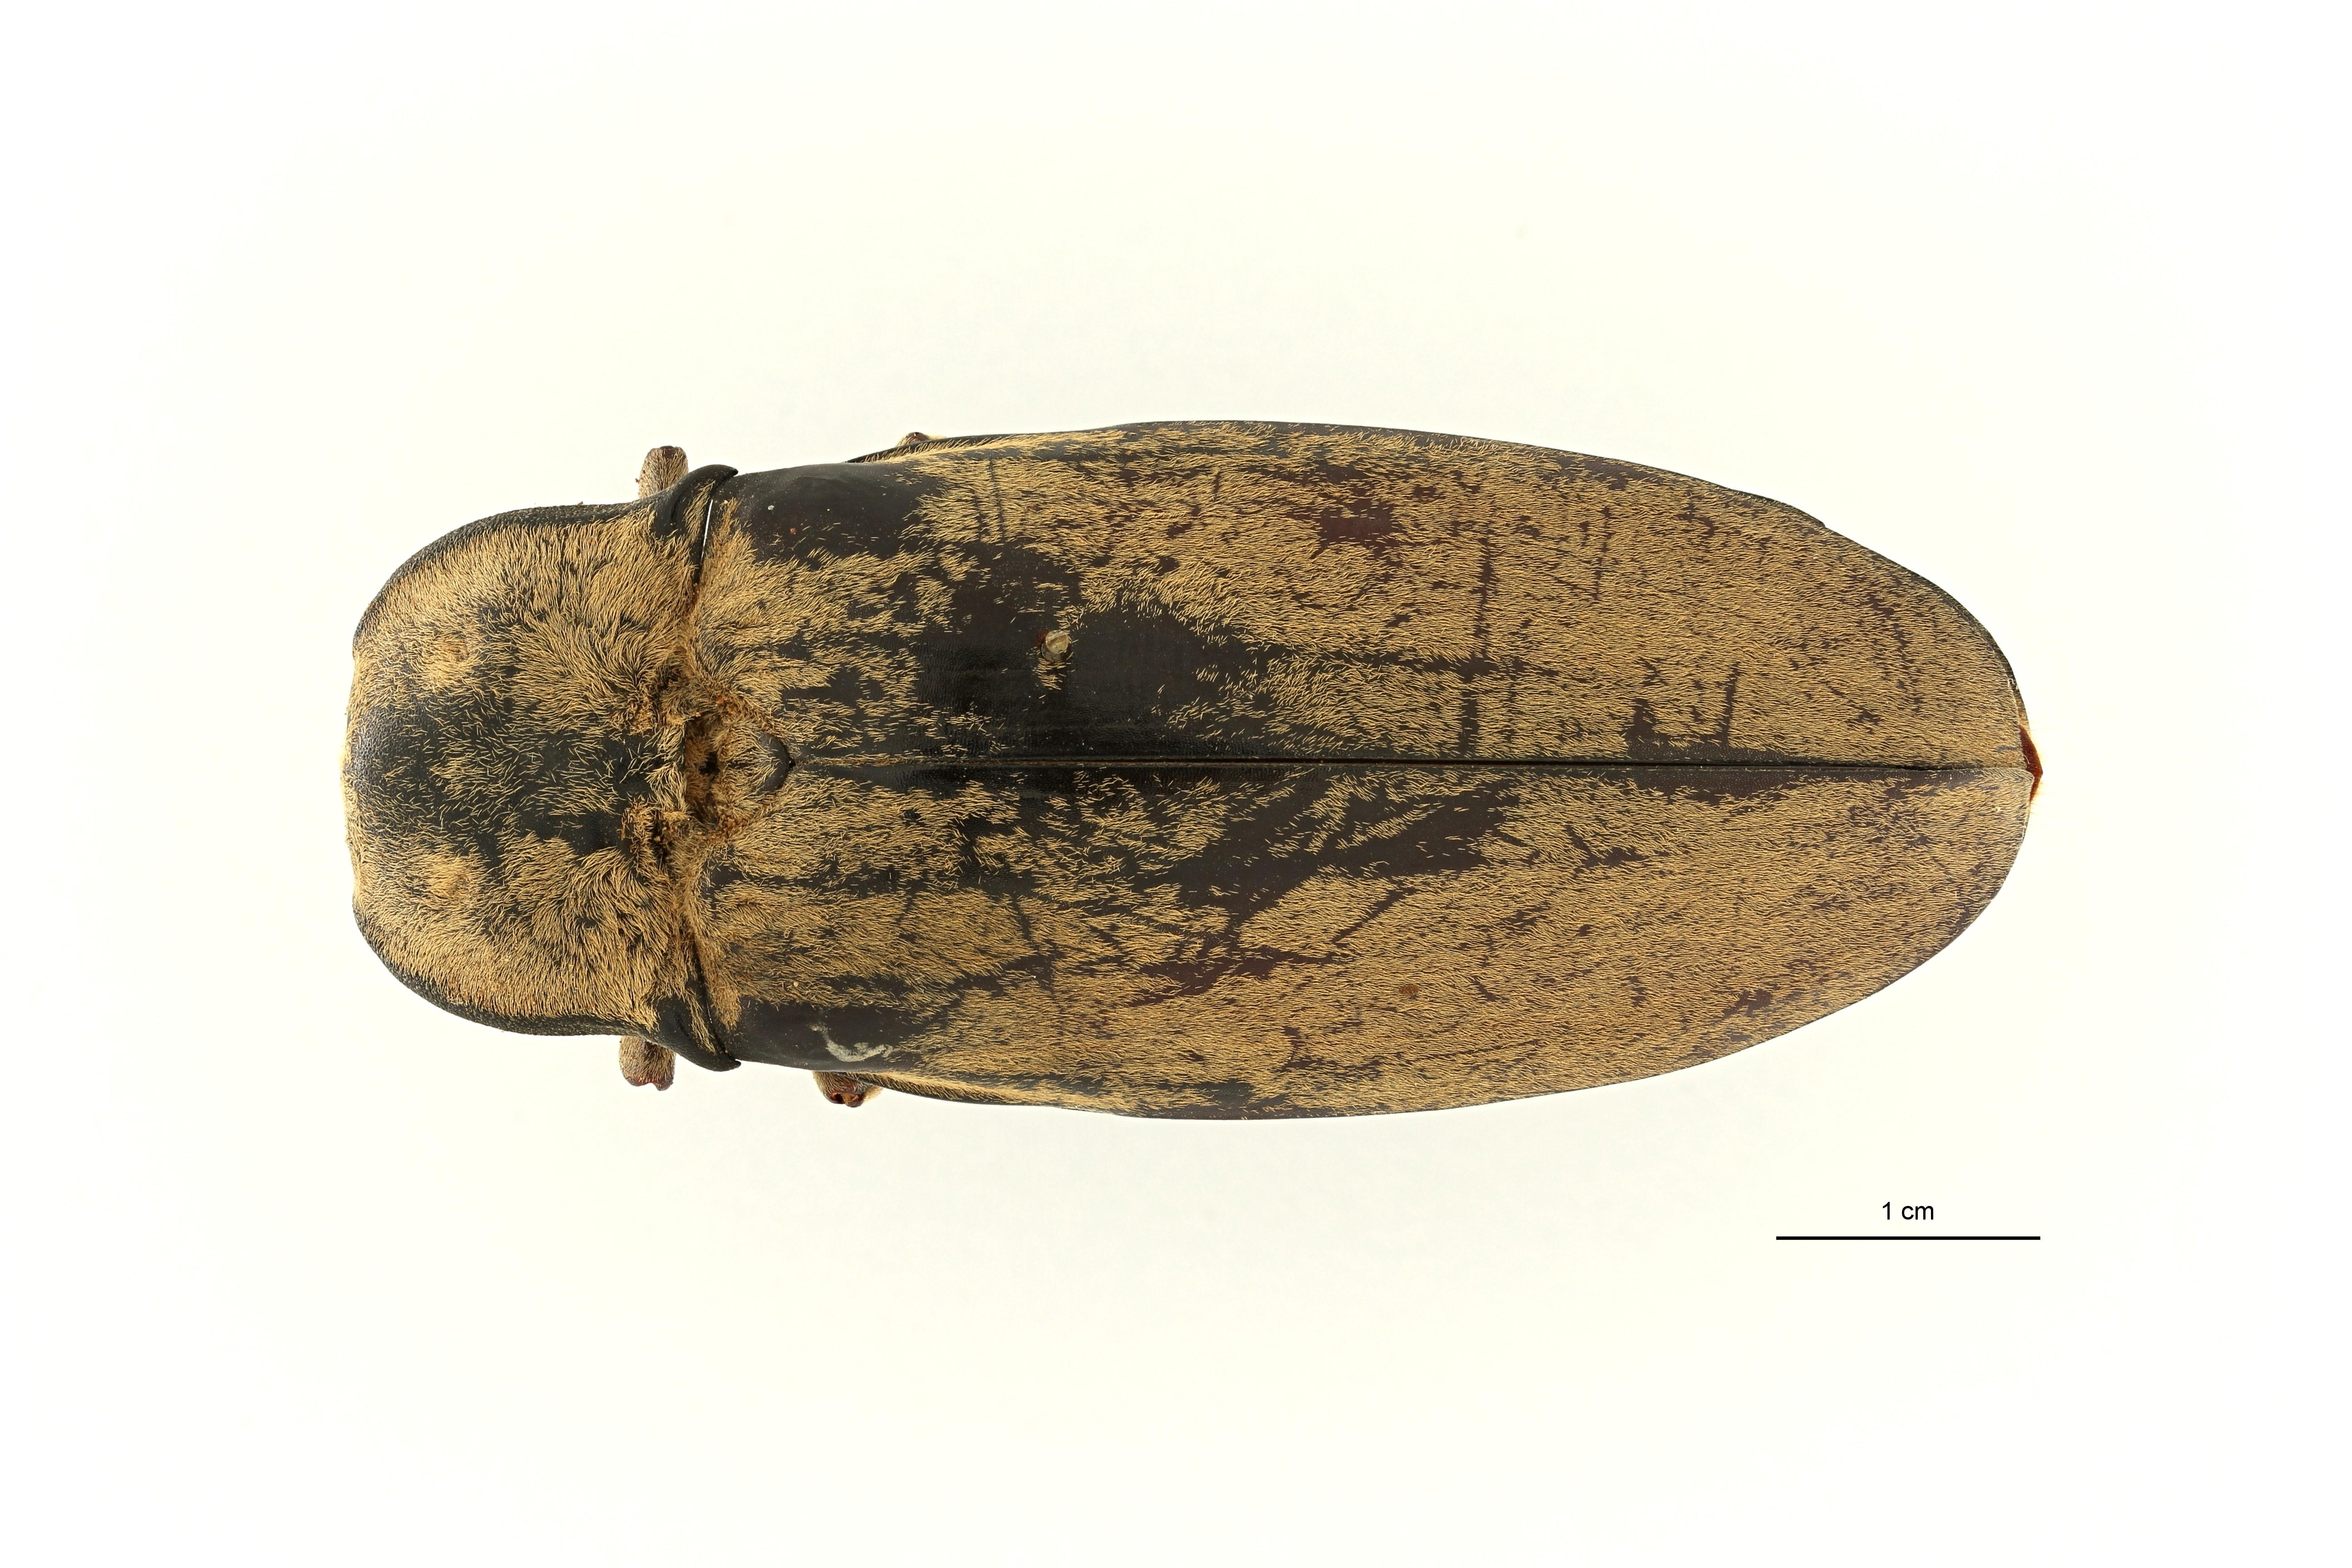 Tetralobus flabellicornis var cinereus t2 D ZS PMax Scaled.jpeg